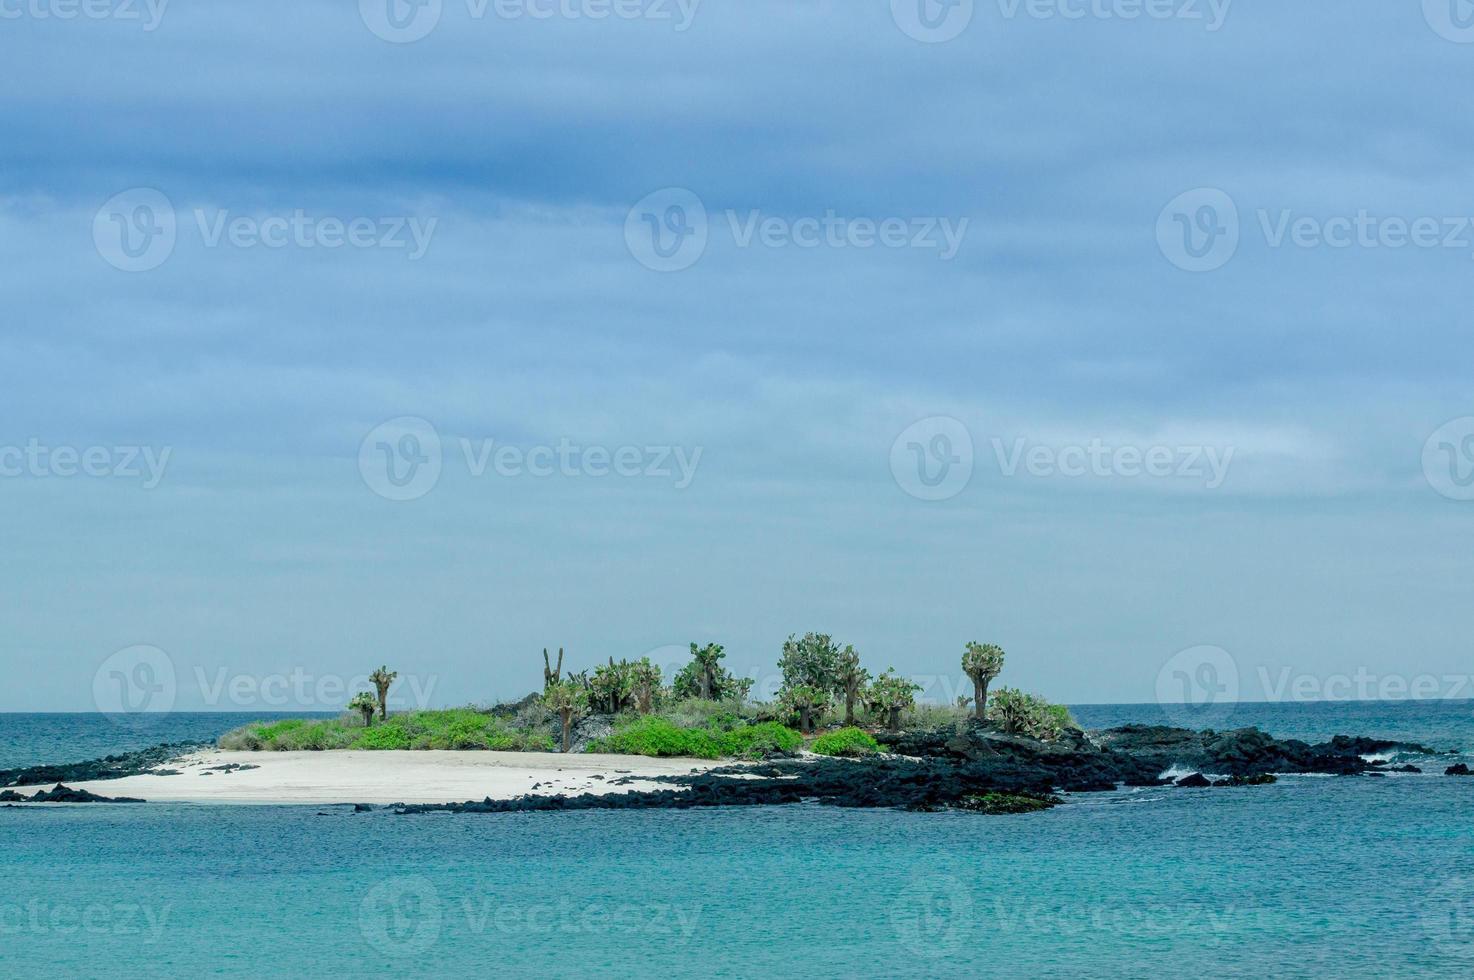 bellissimo isolotto nell'arcipelago delle isole galapagos foto